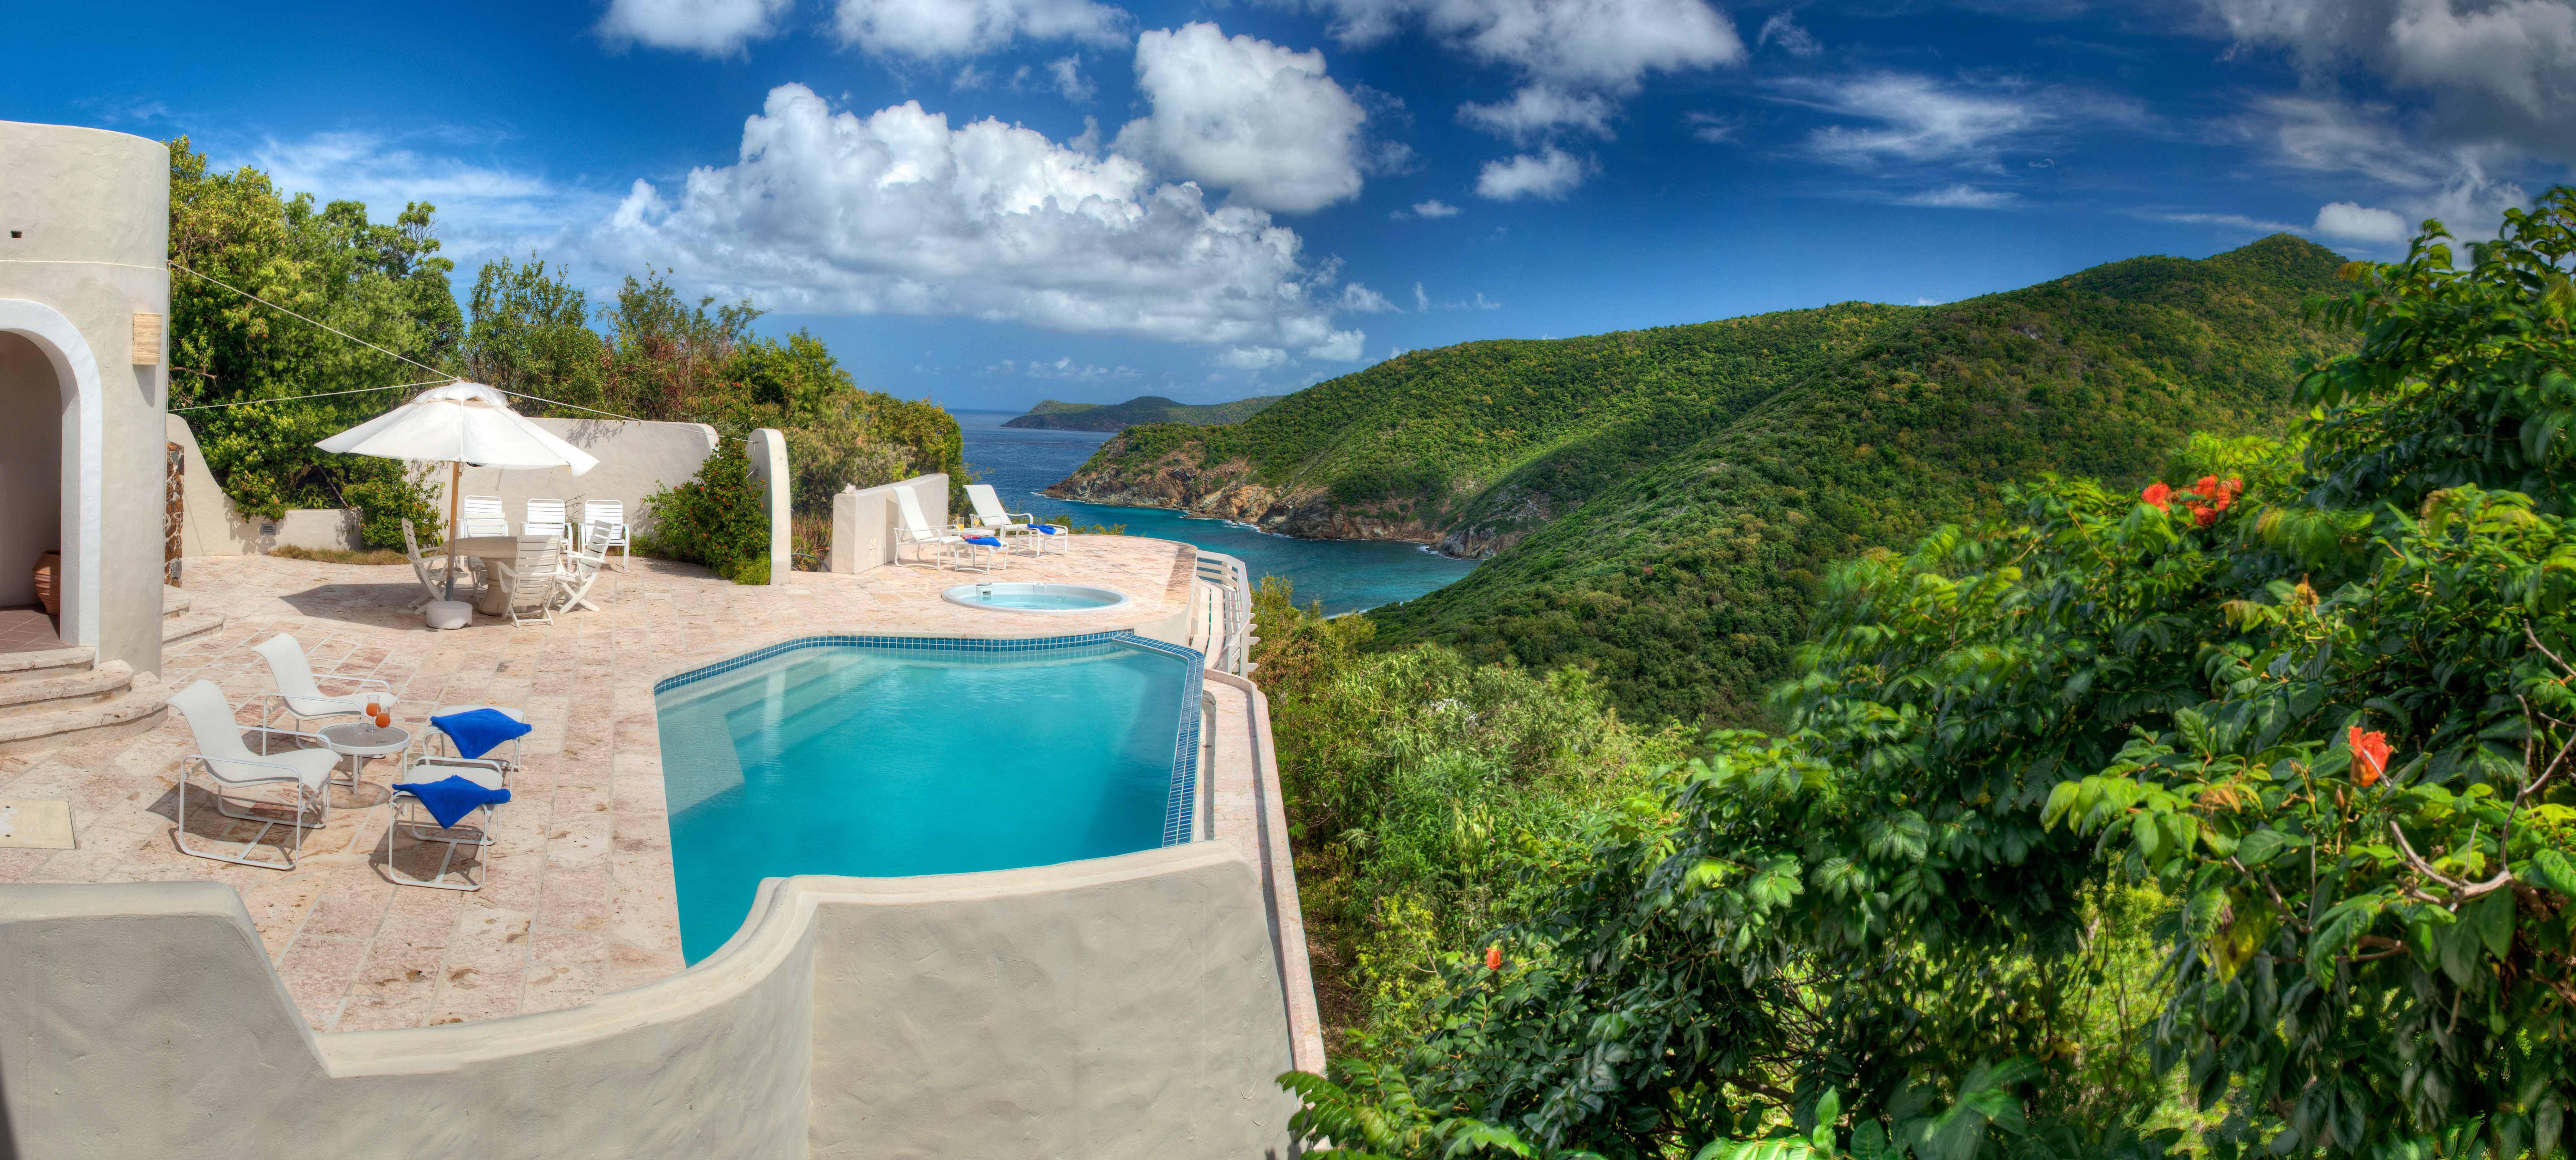 private island honeymoons guana island villa harbor pool